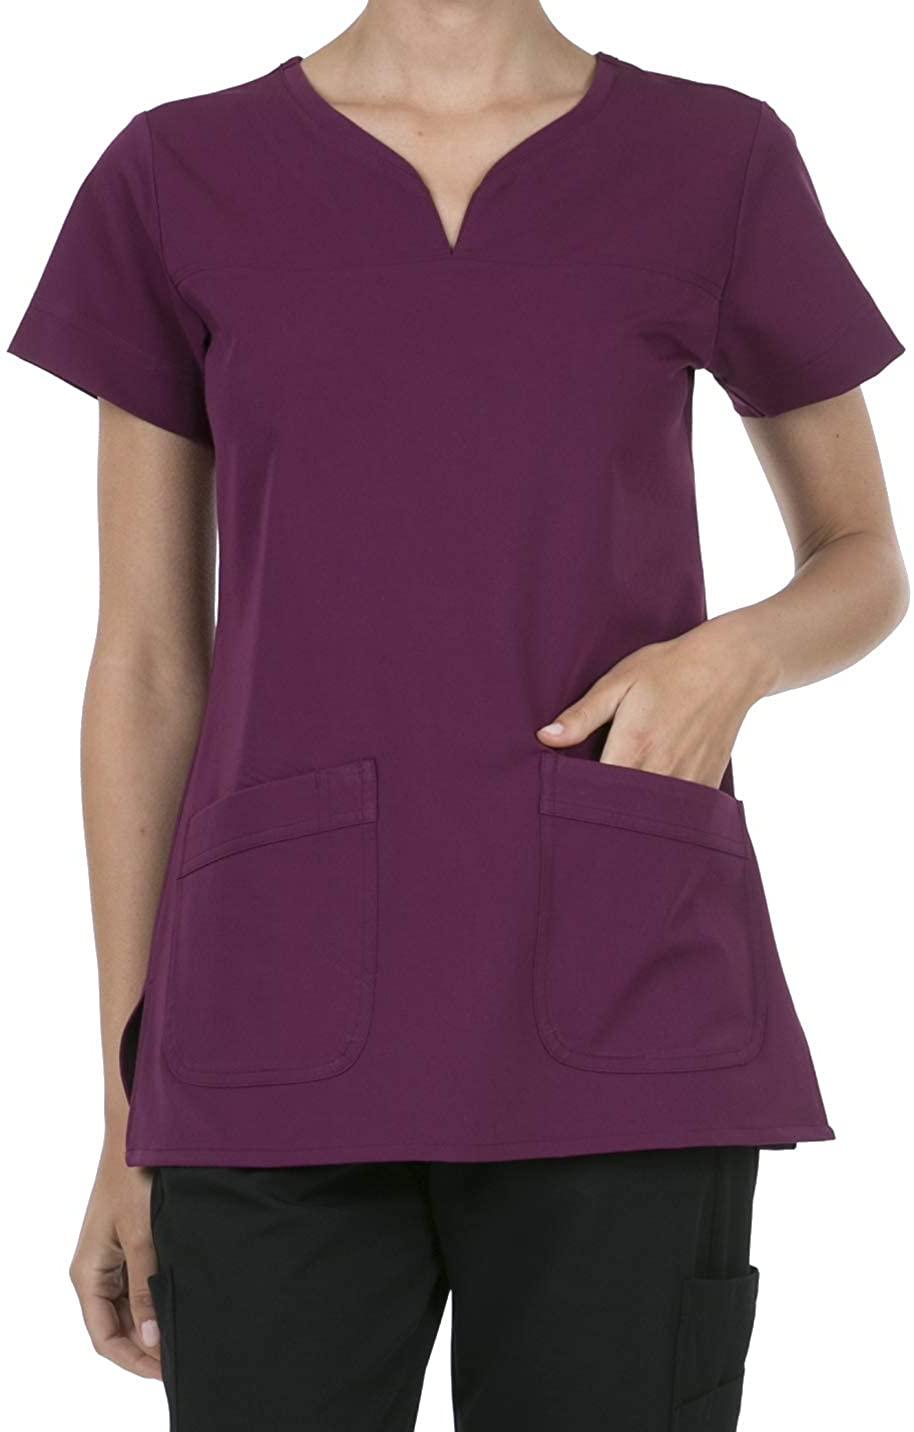 SHOP TIRZAH Women's Uniform Scrubs Medical 2 Pocket Scrub Top, Wine, 3XL_Plus